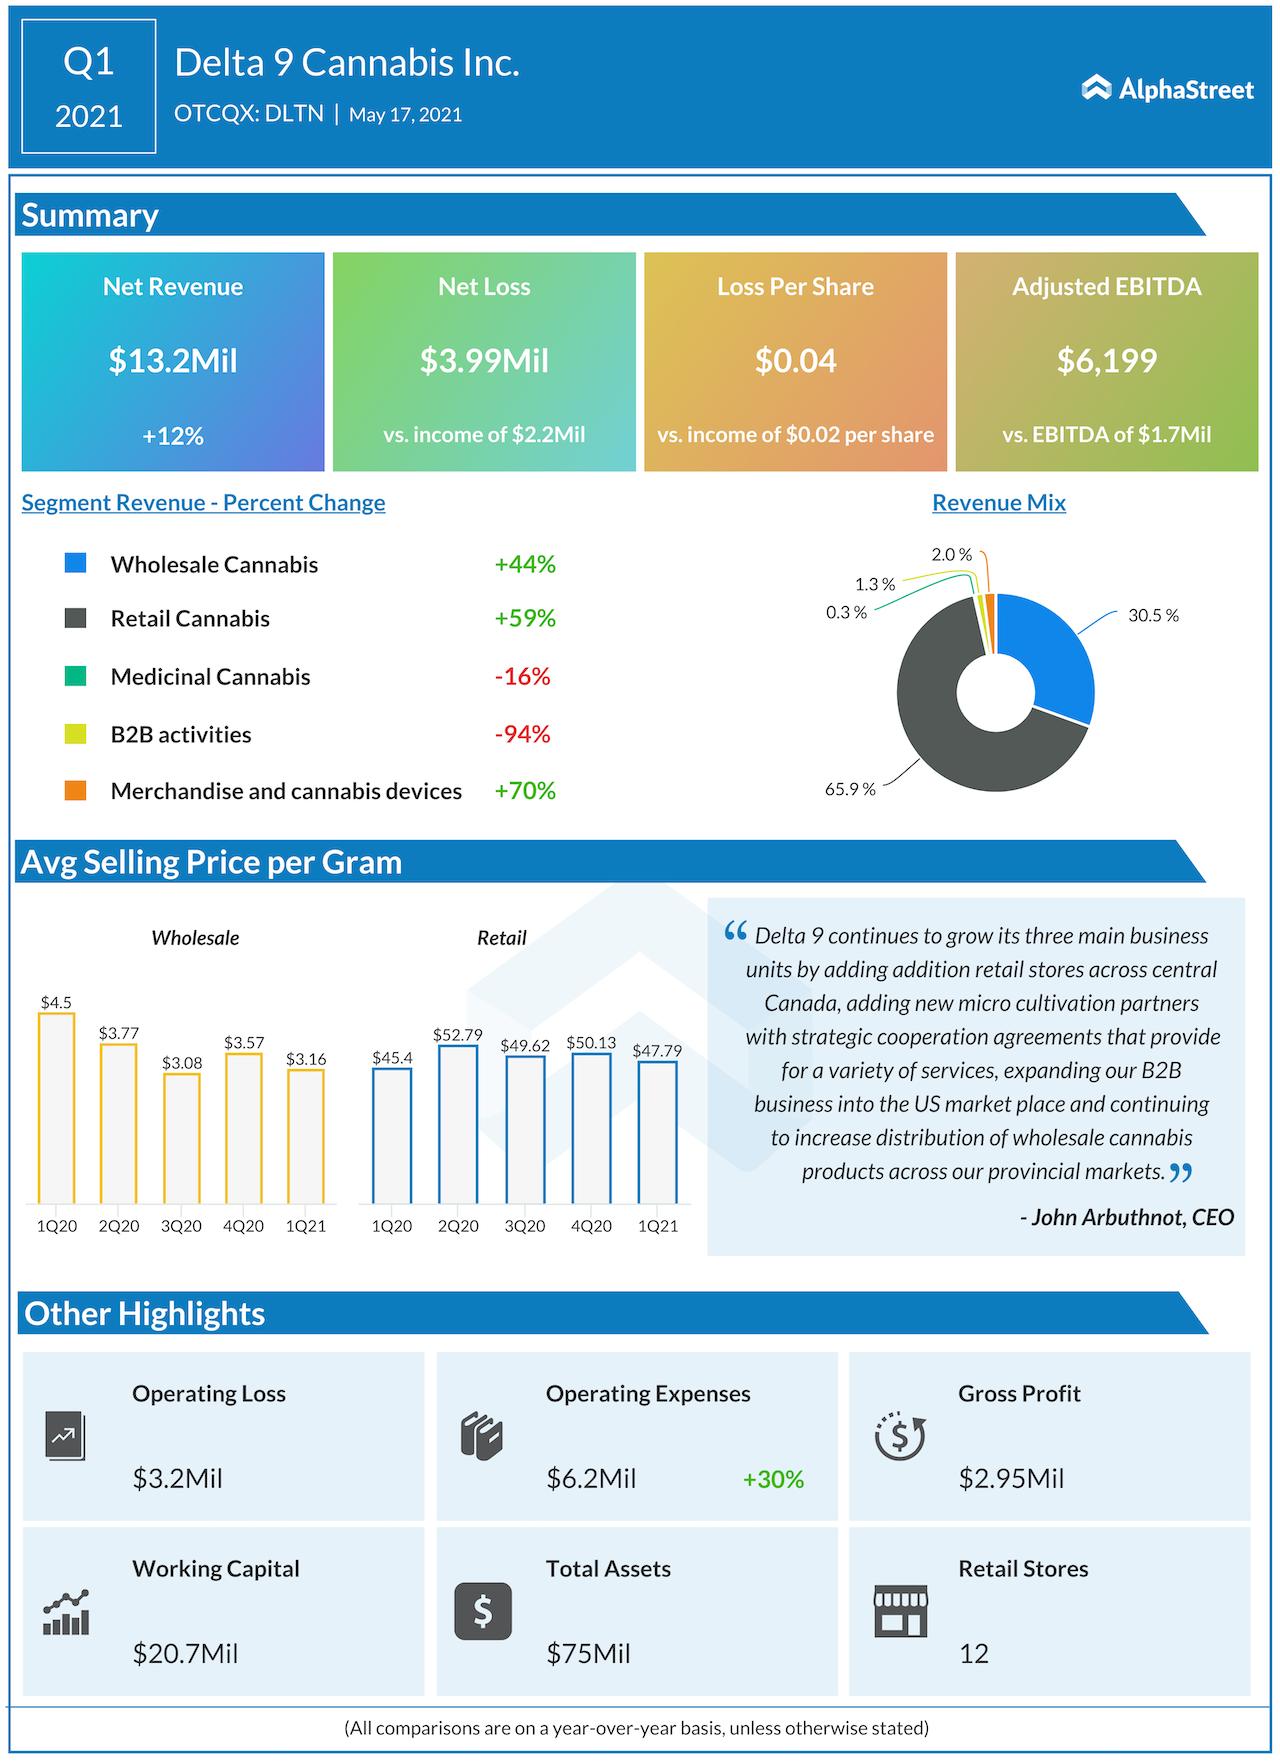 Delta 9 cannabis Q2 2021 earnings